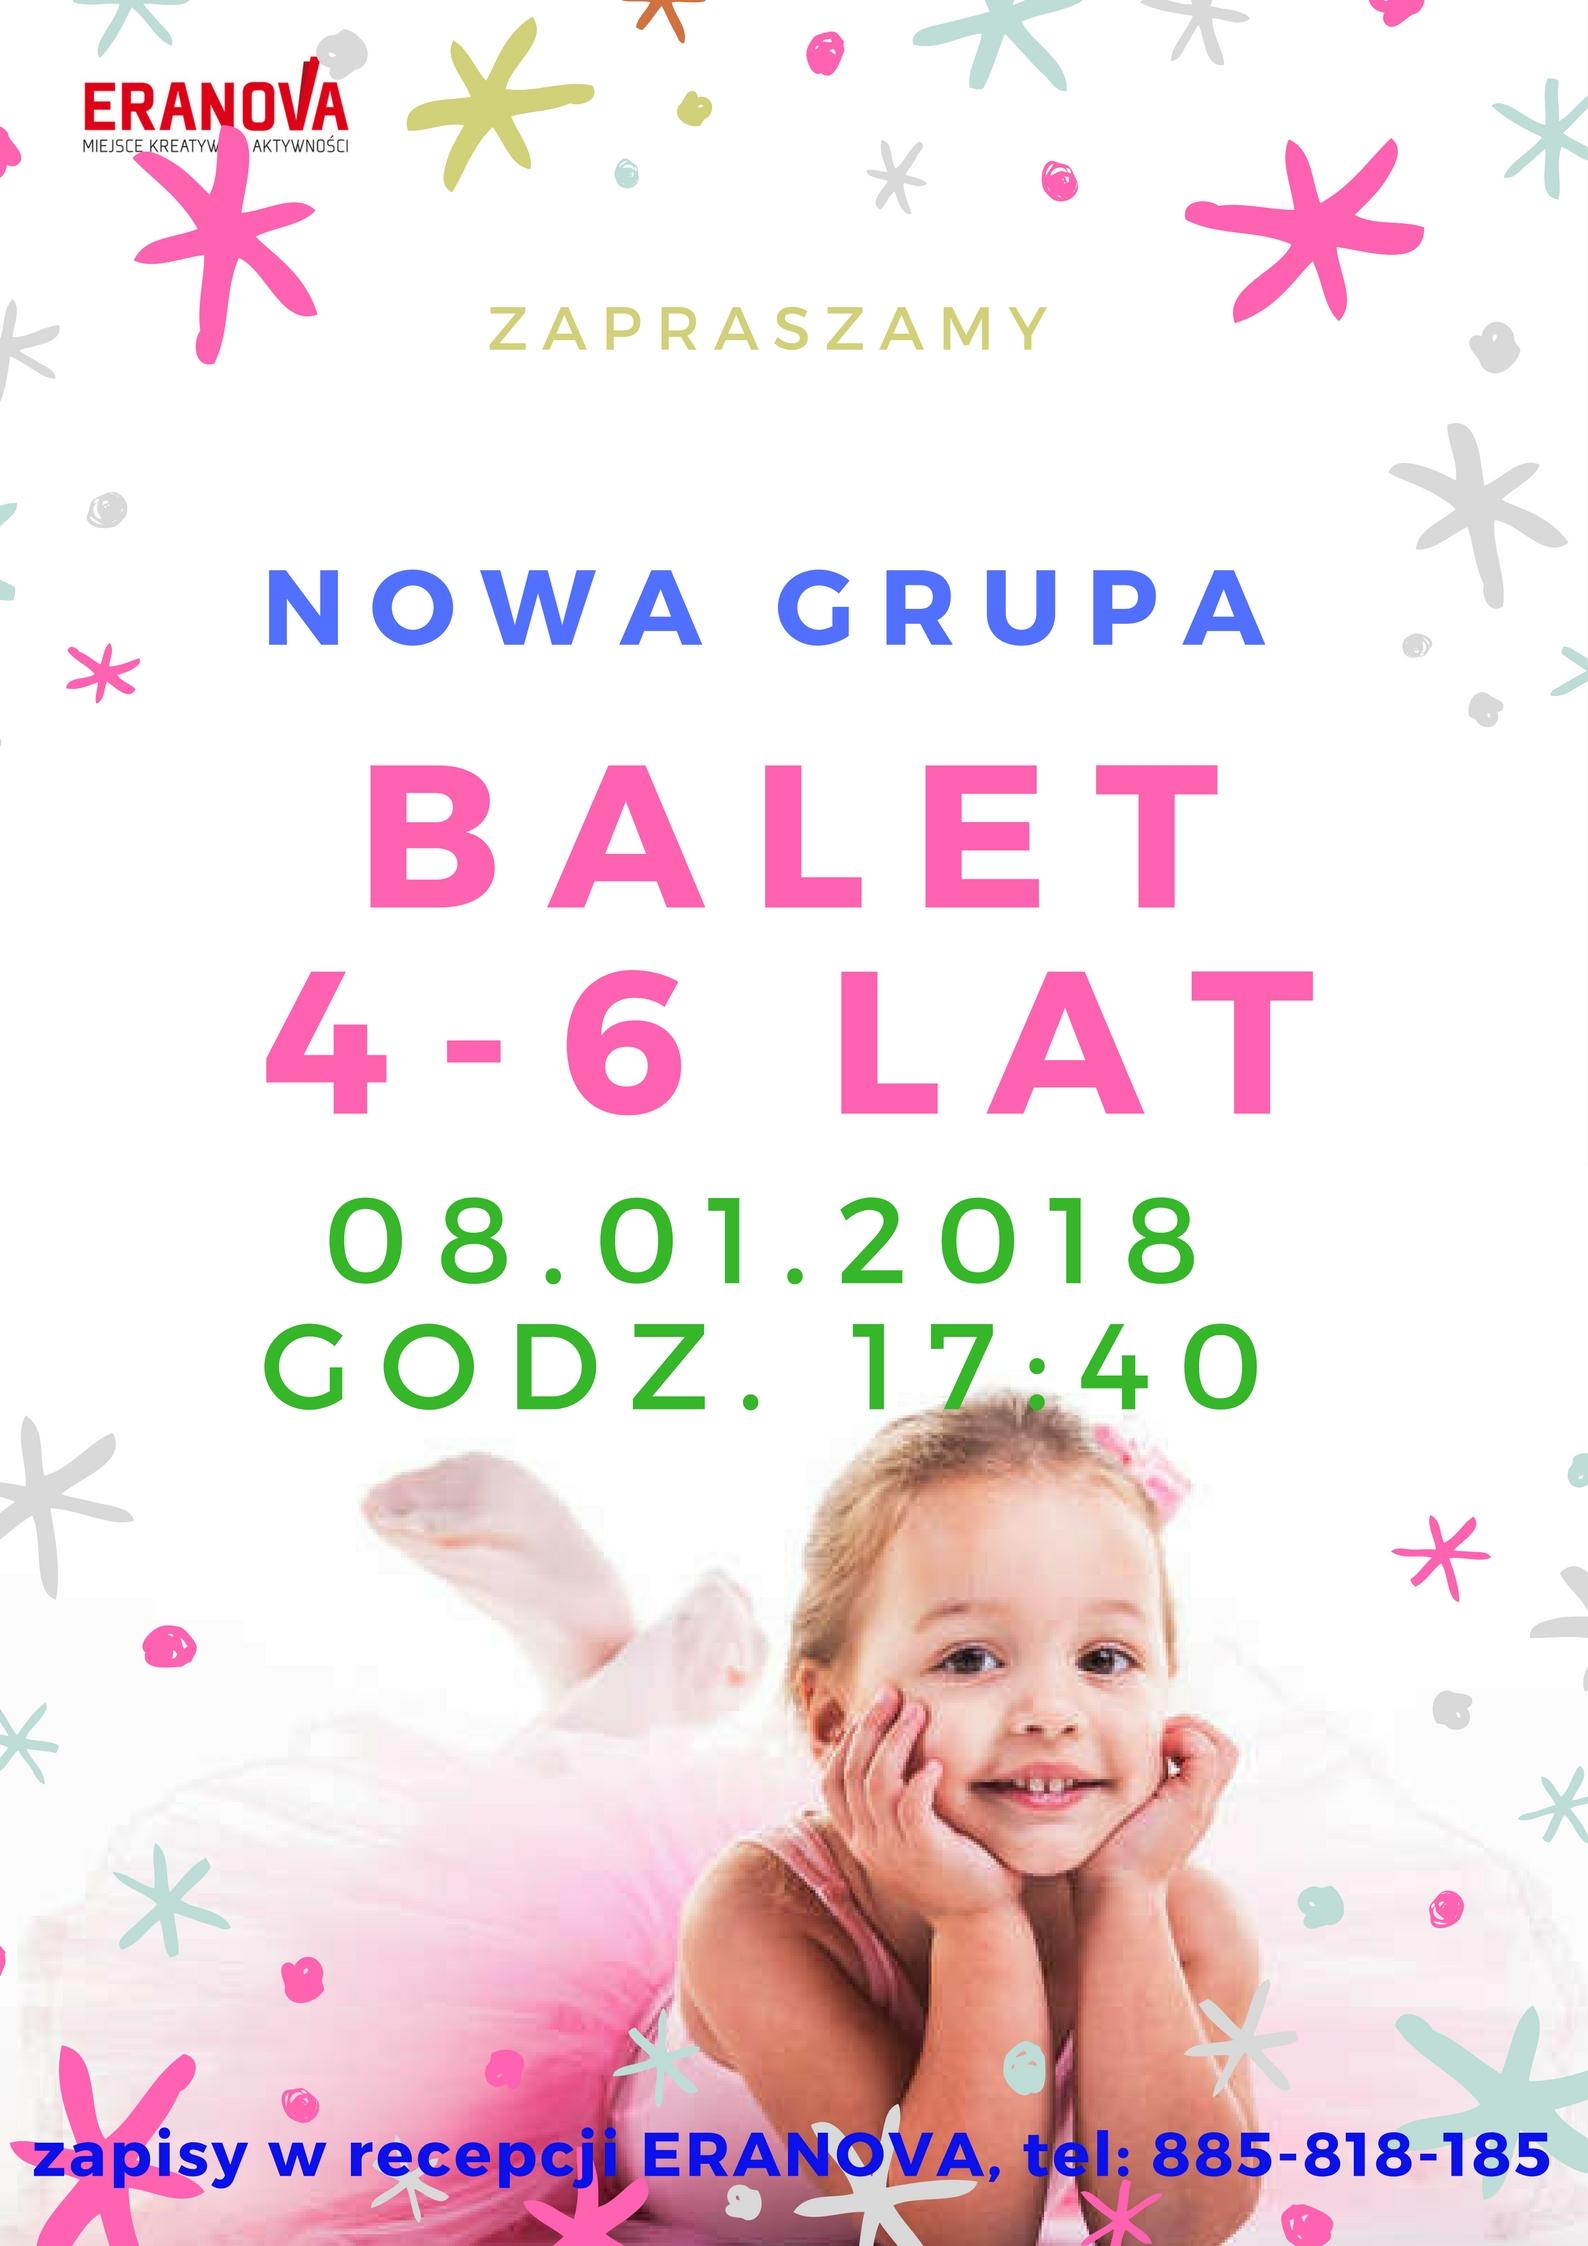 http://m.eranova.pl/2017/12/orig/let-s-celebrate-2529.jpg